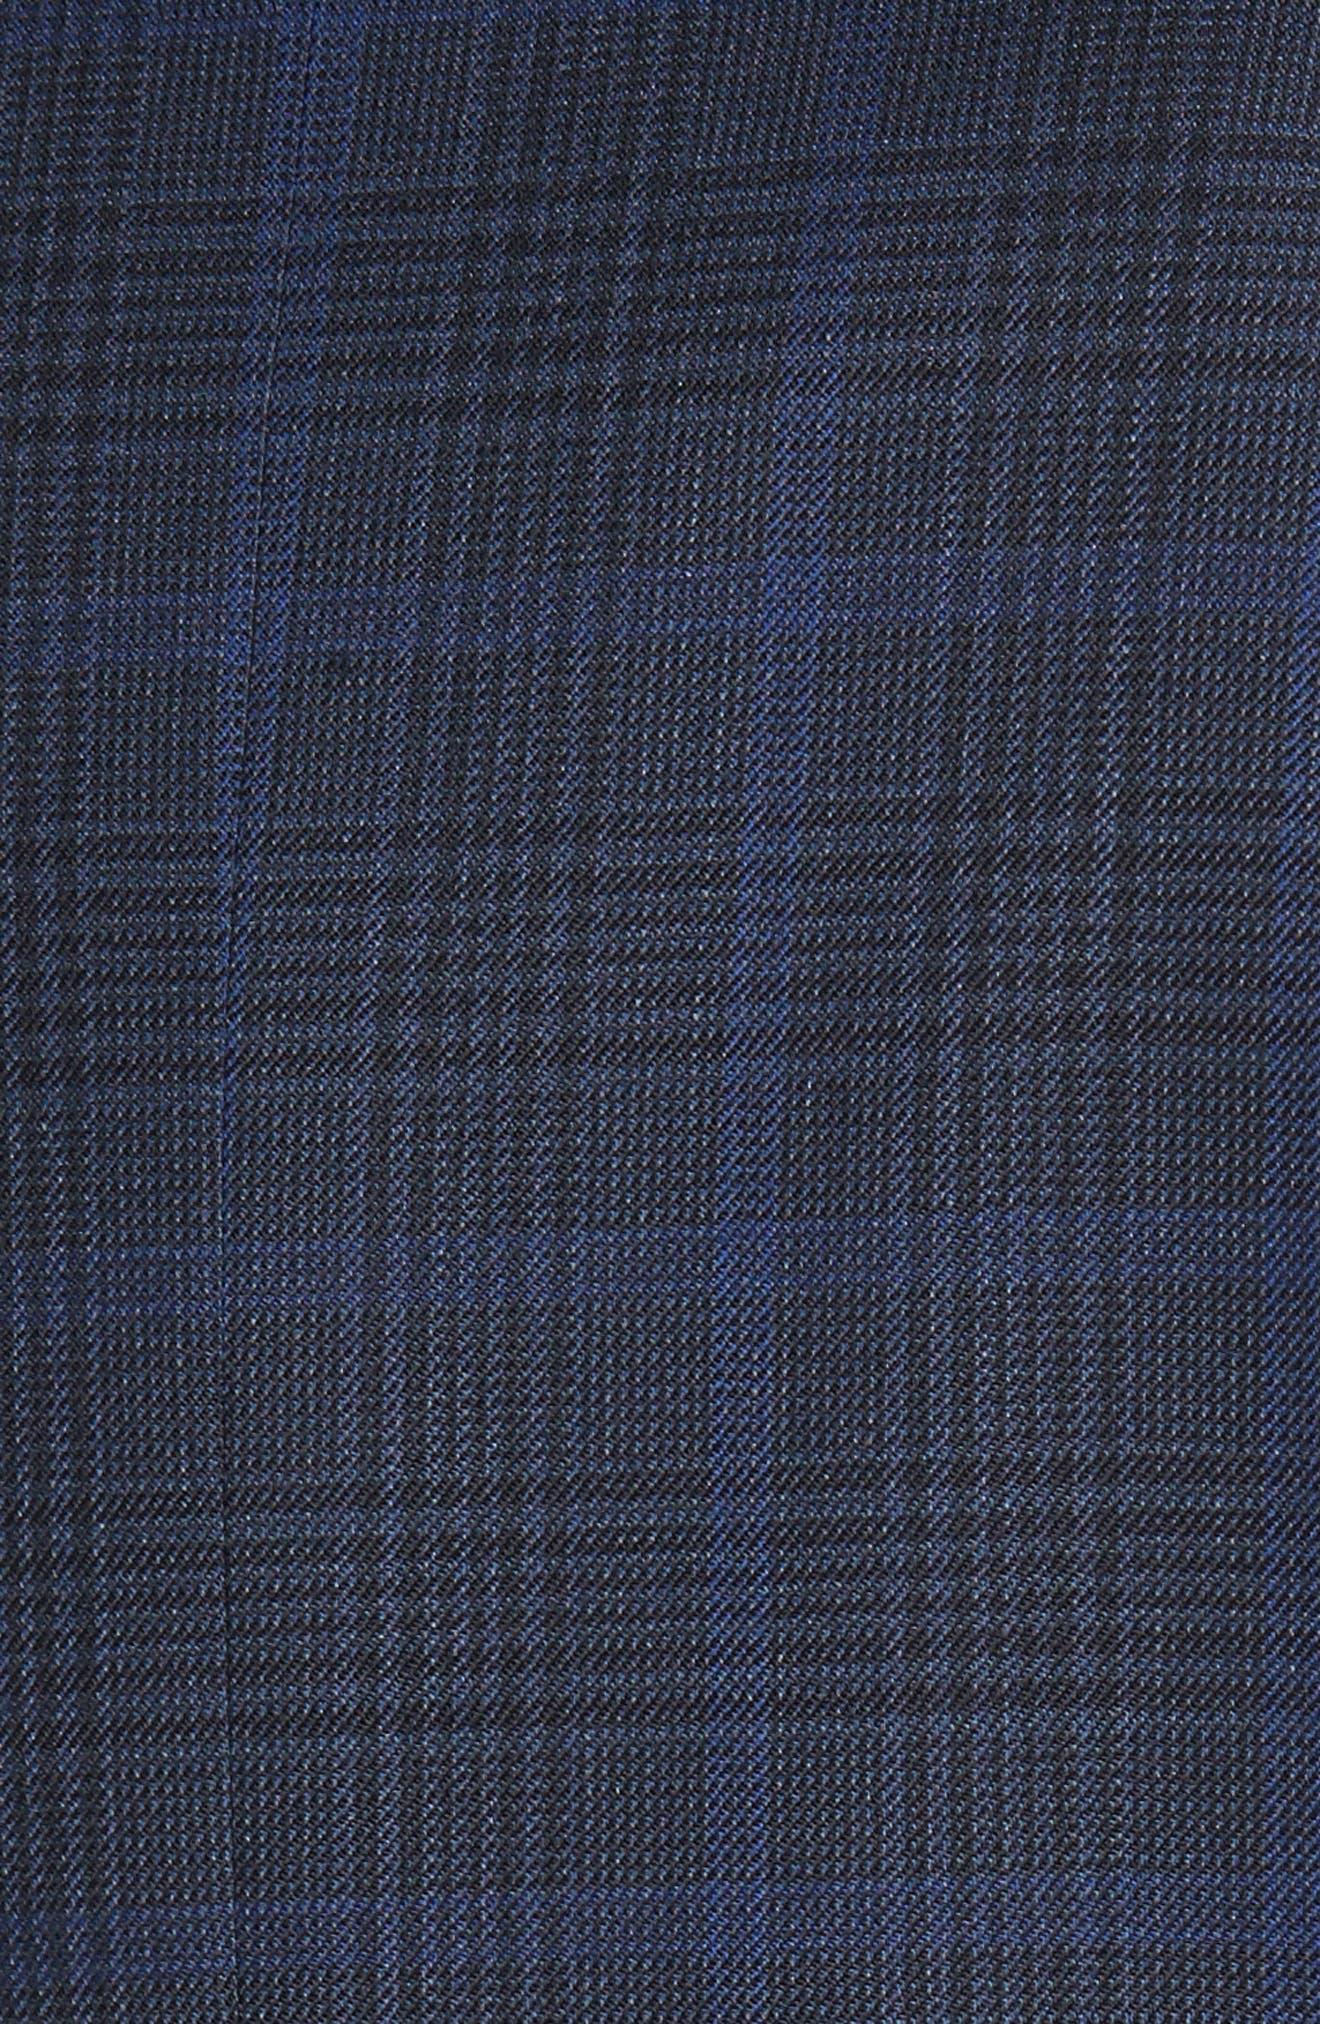 Alternate Image 5  - JB Britches Classic Fit Plaid Wool Sport Coat